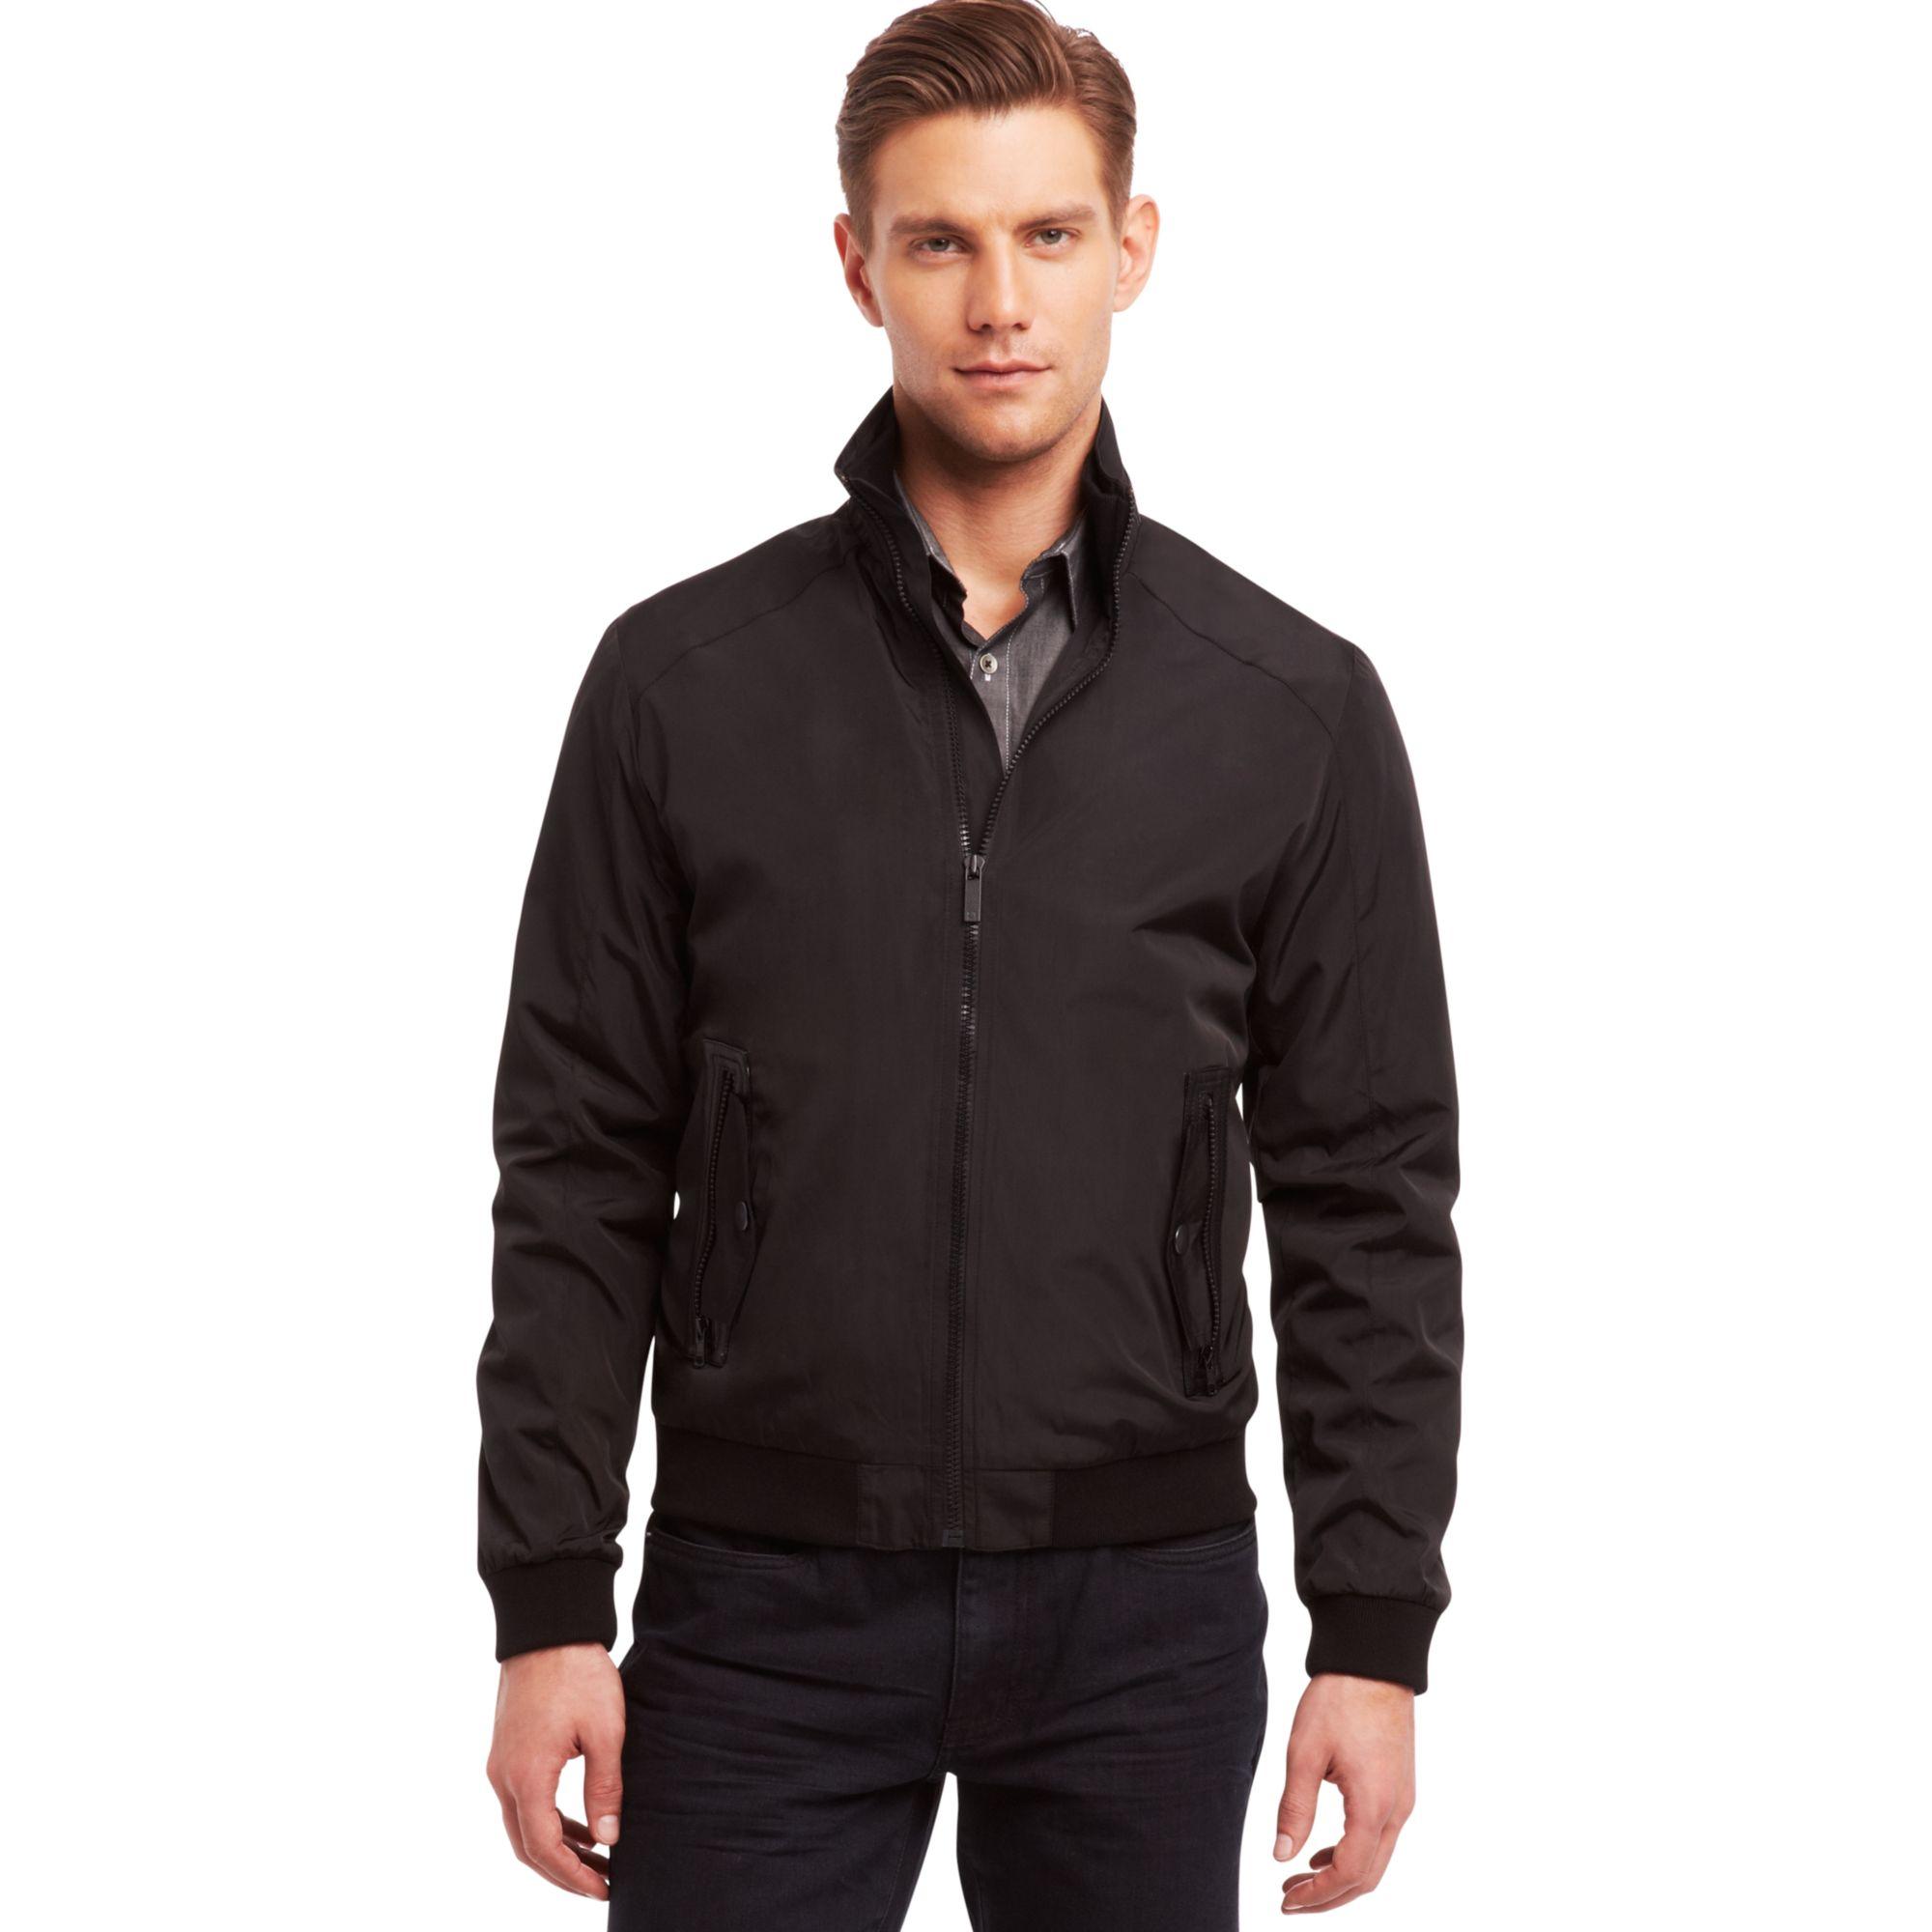 Black pleather jacket women